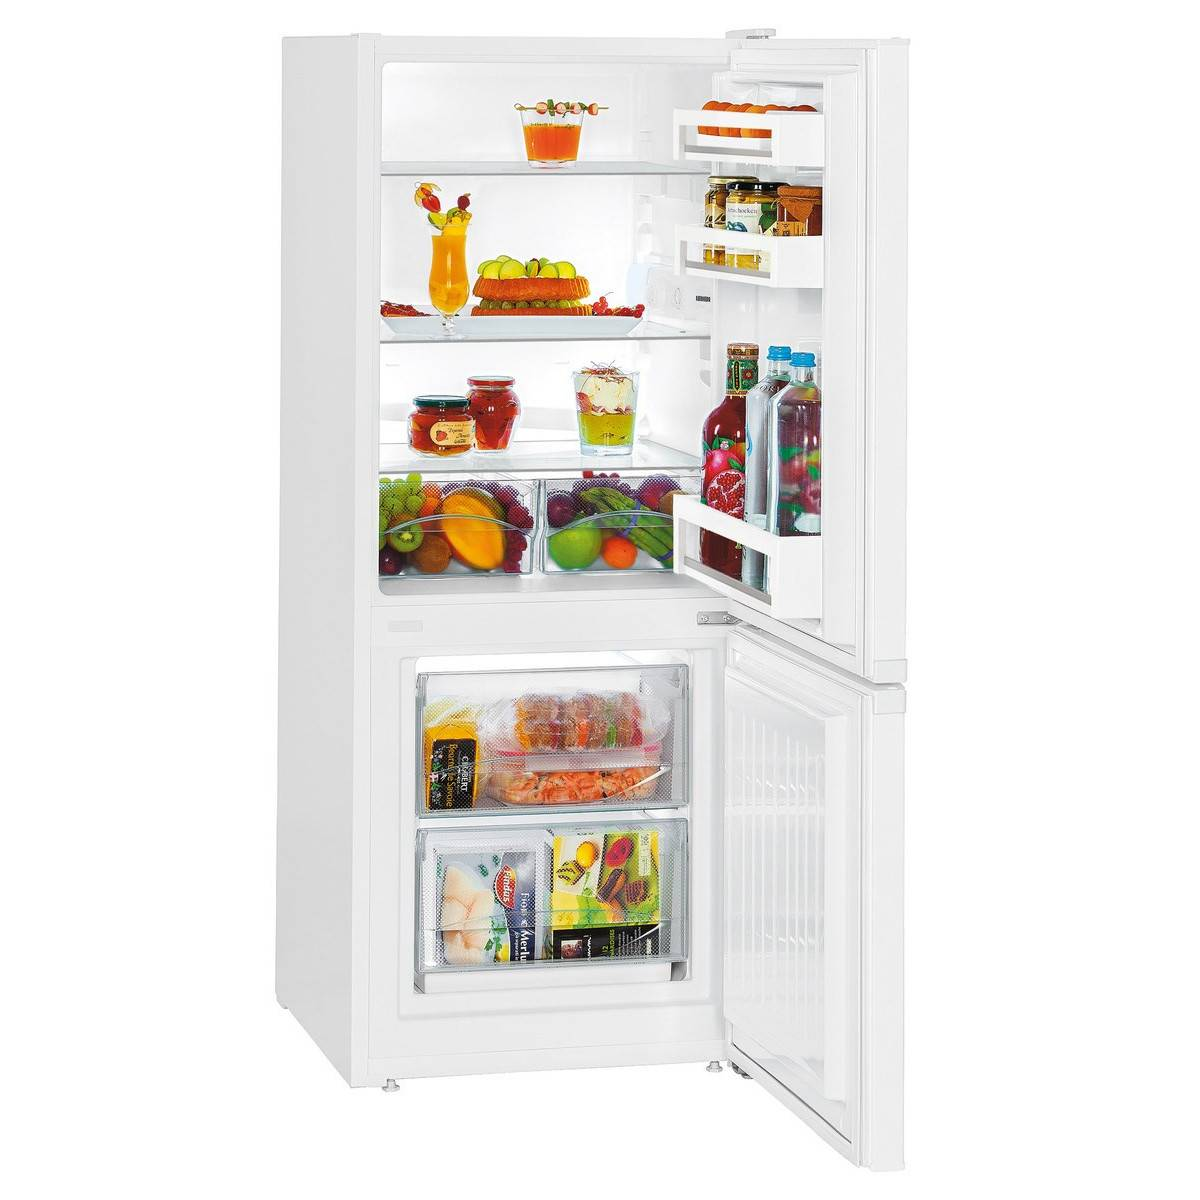 Liebherr CU2331 Fridge Freezer